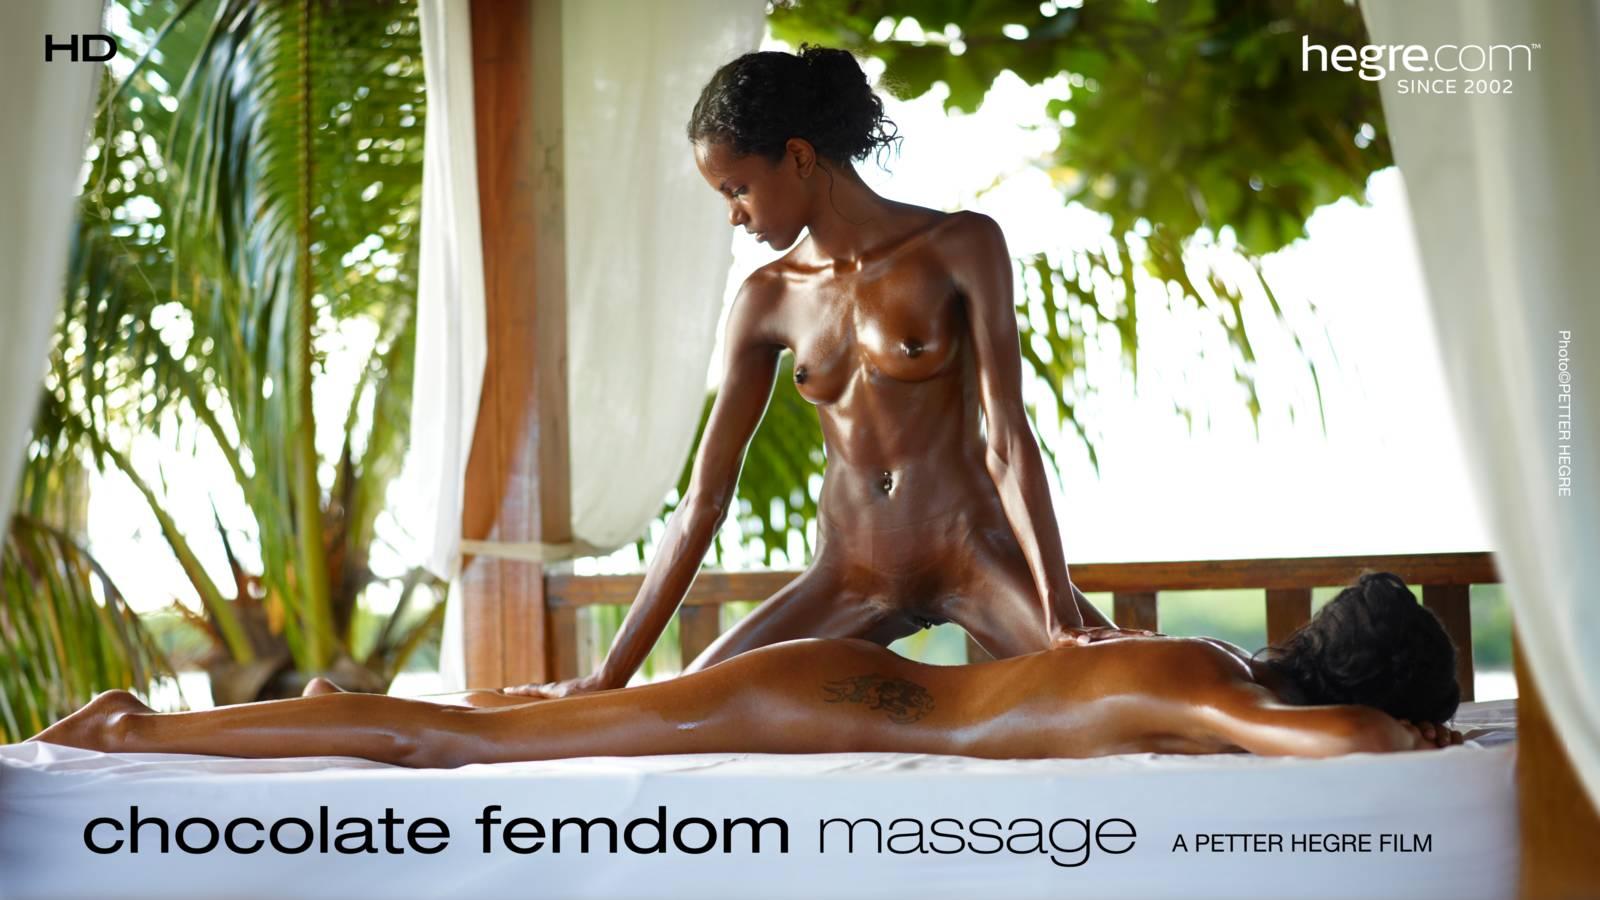 valerie tiefe massage hegre